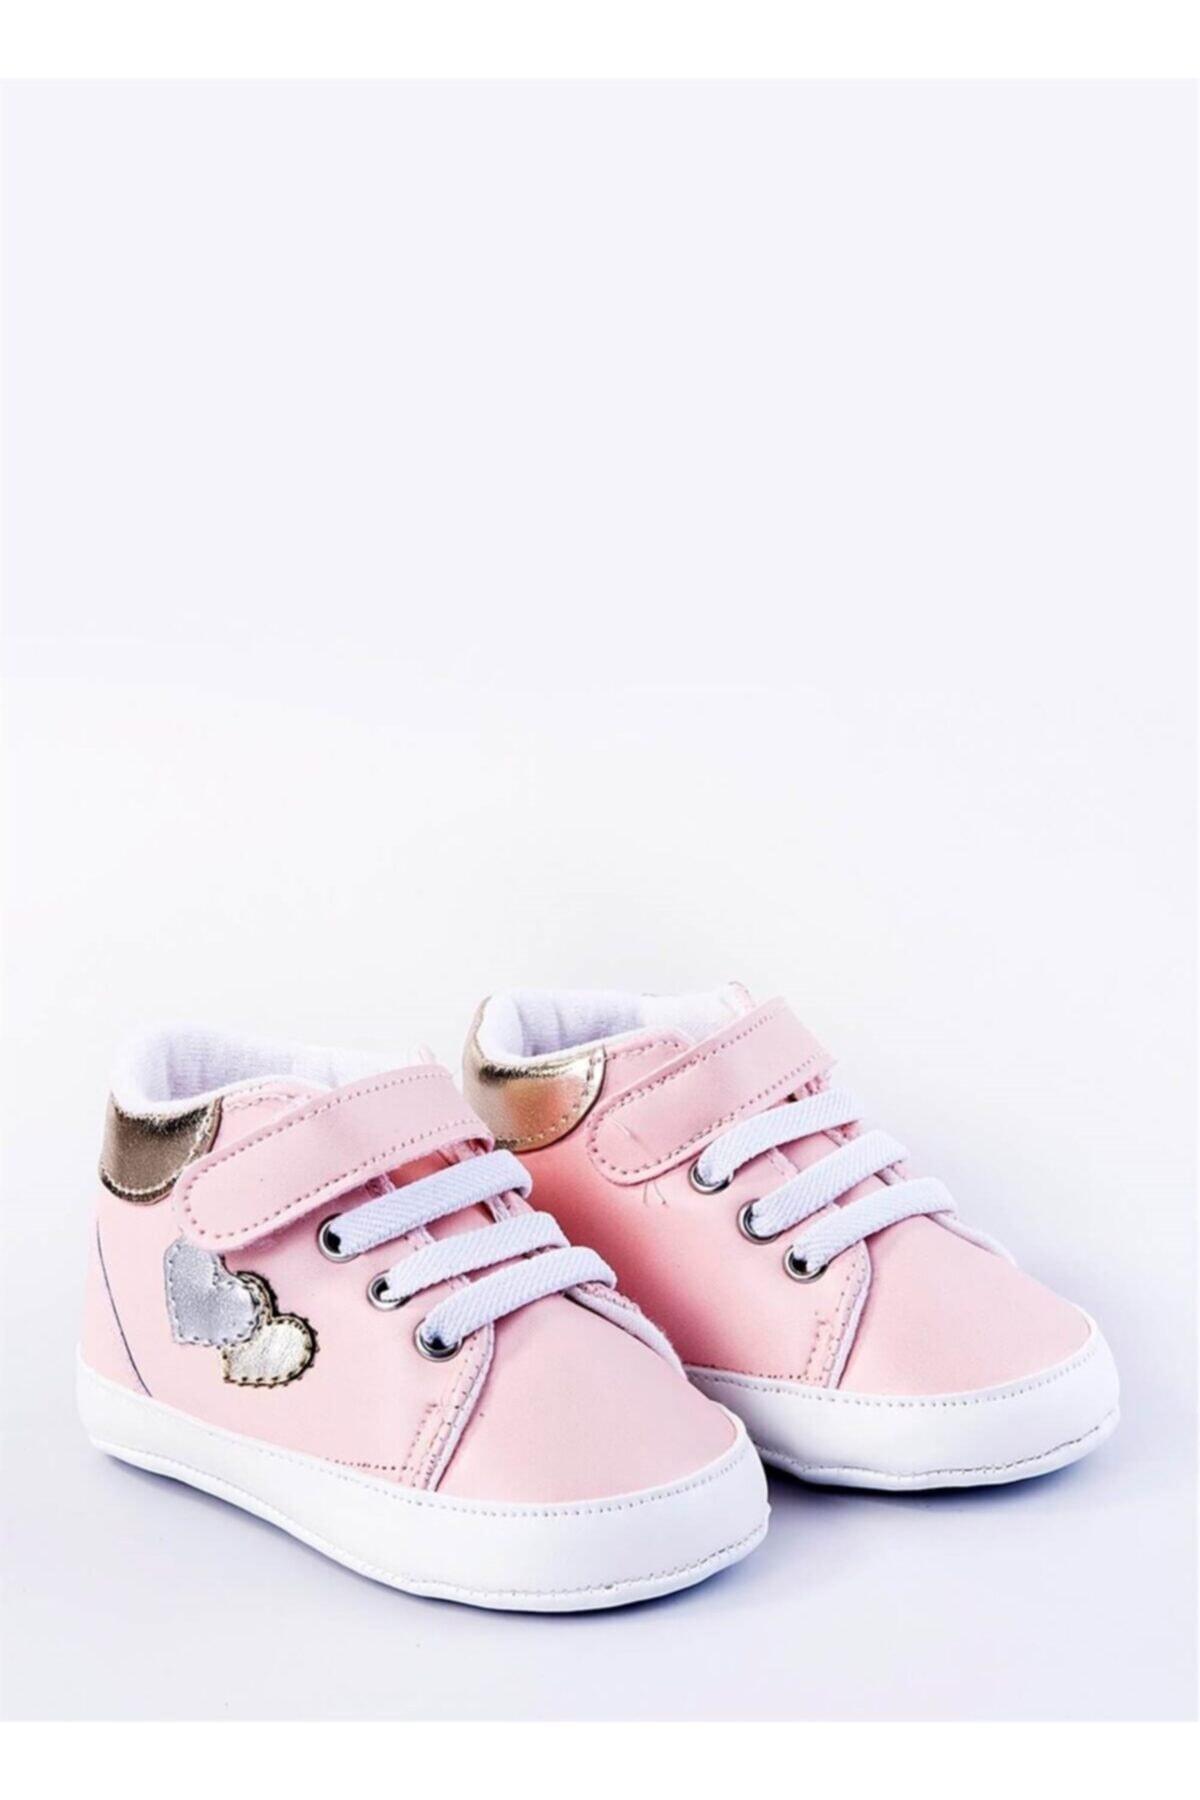 Flaneur Baby Girl Powder Shoes 2021 Premium Quality